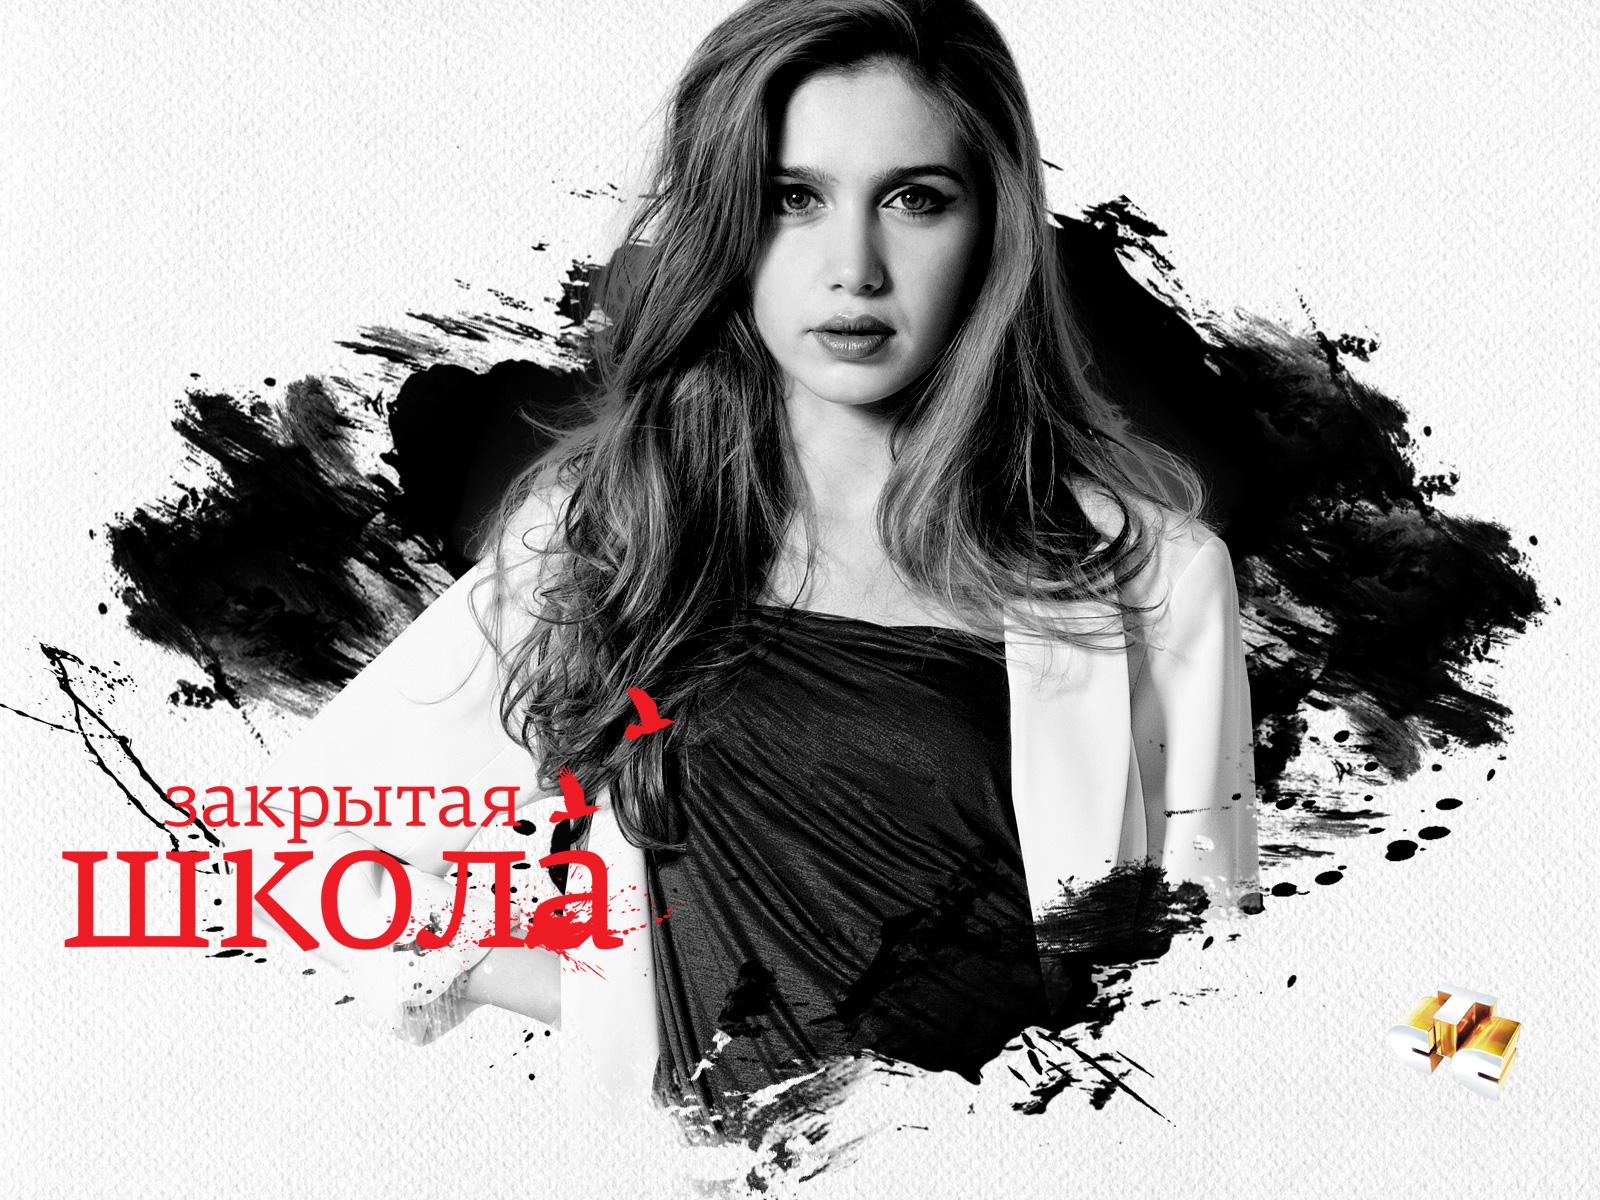 Обои: Закрытая школа: kinopoisk.ru/picture/1874790/w_size/1600